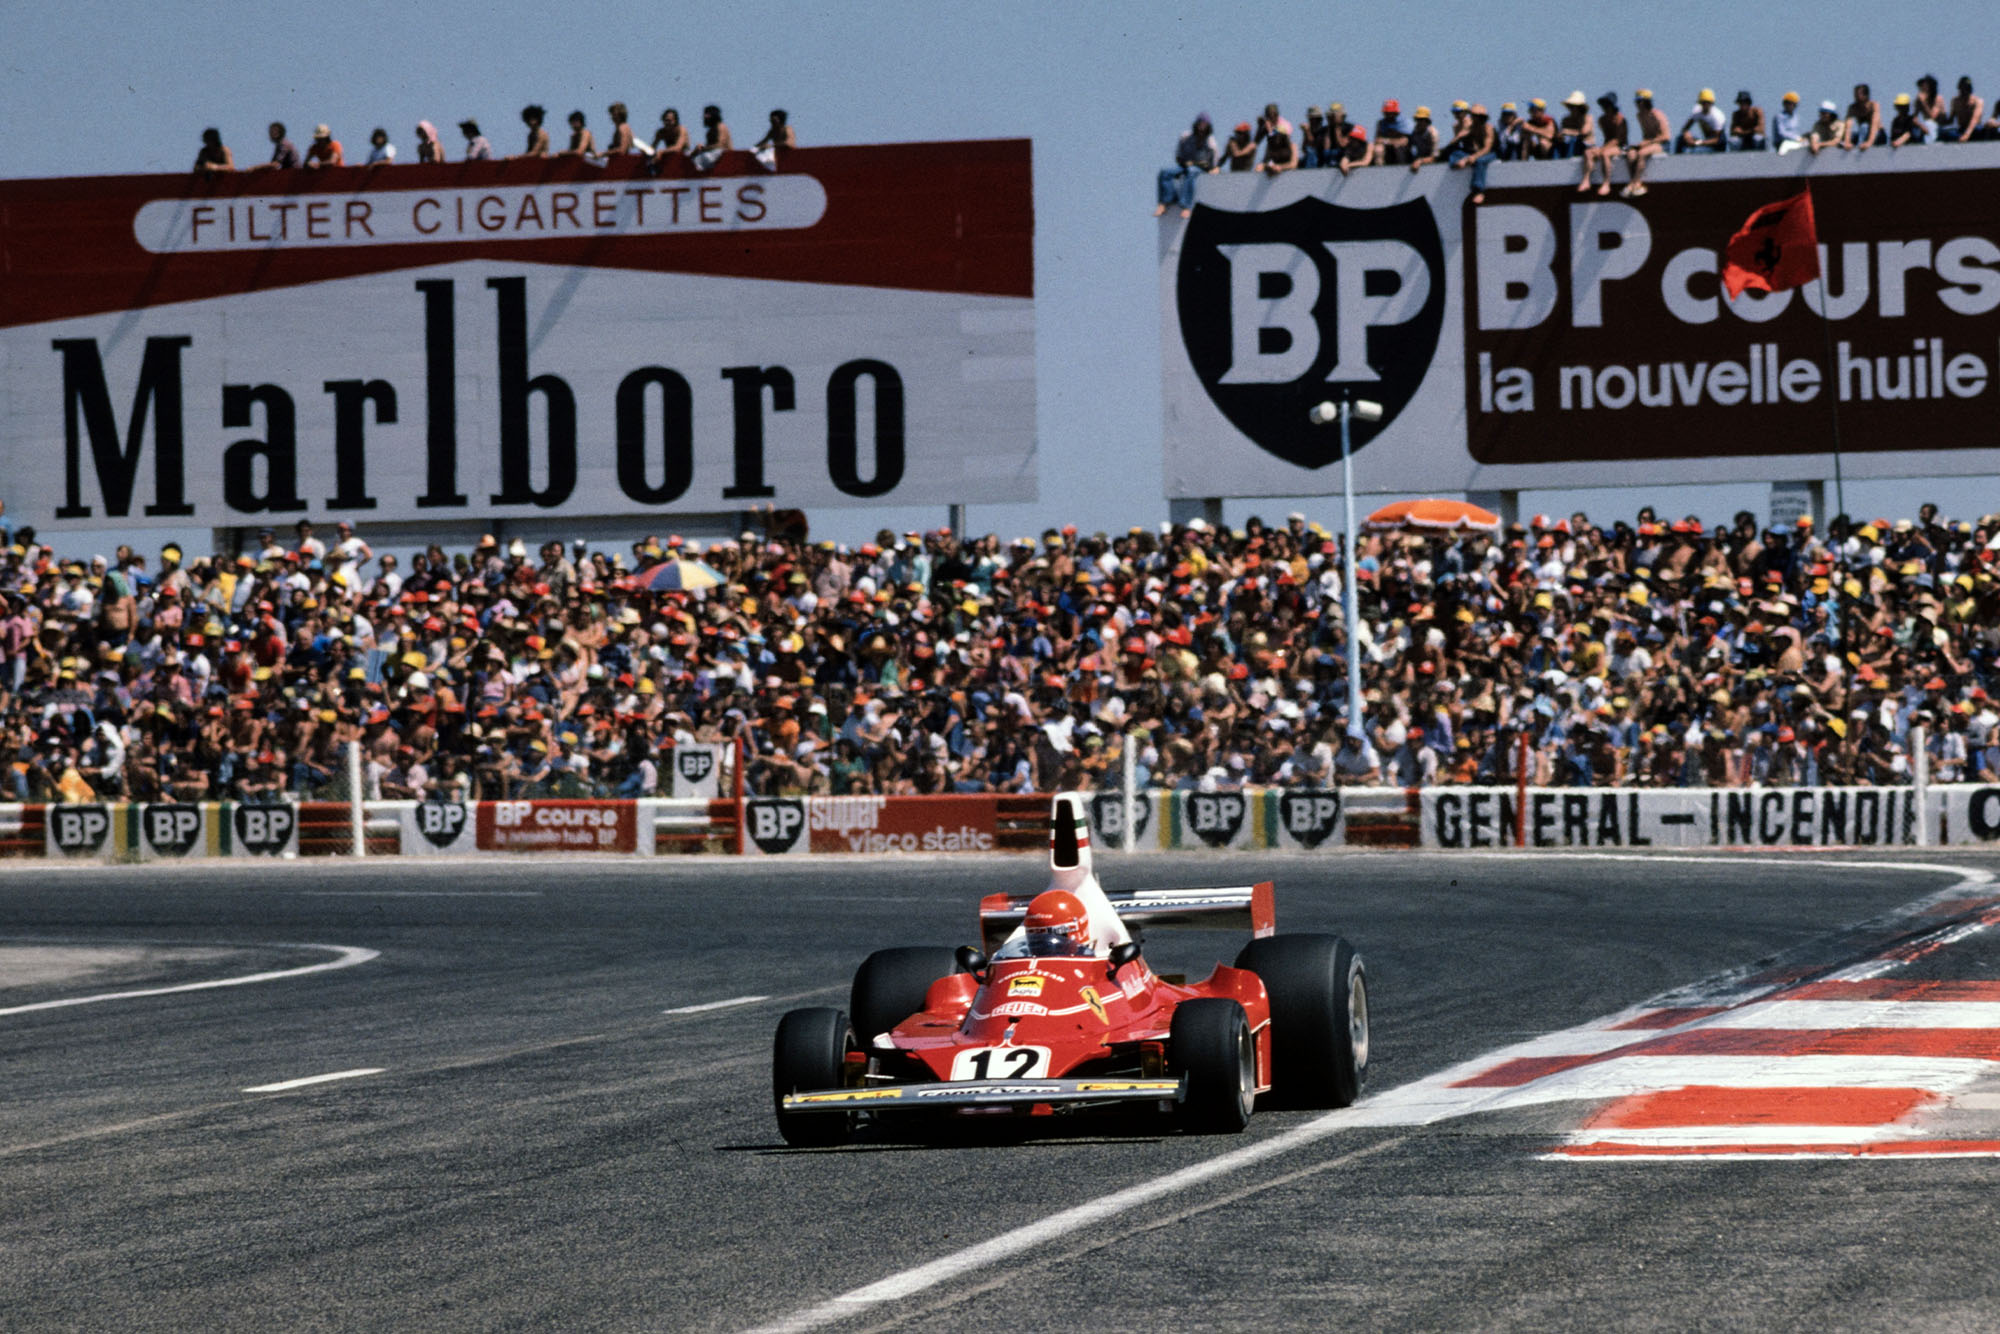 Niki Lauda (Ferrari) rounds the last corner at the 1975 French Grand Prix, Paul Ricard.